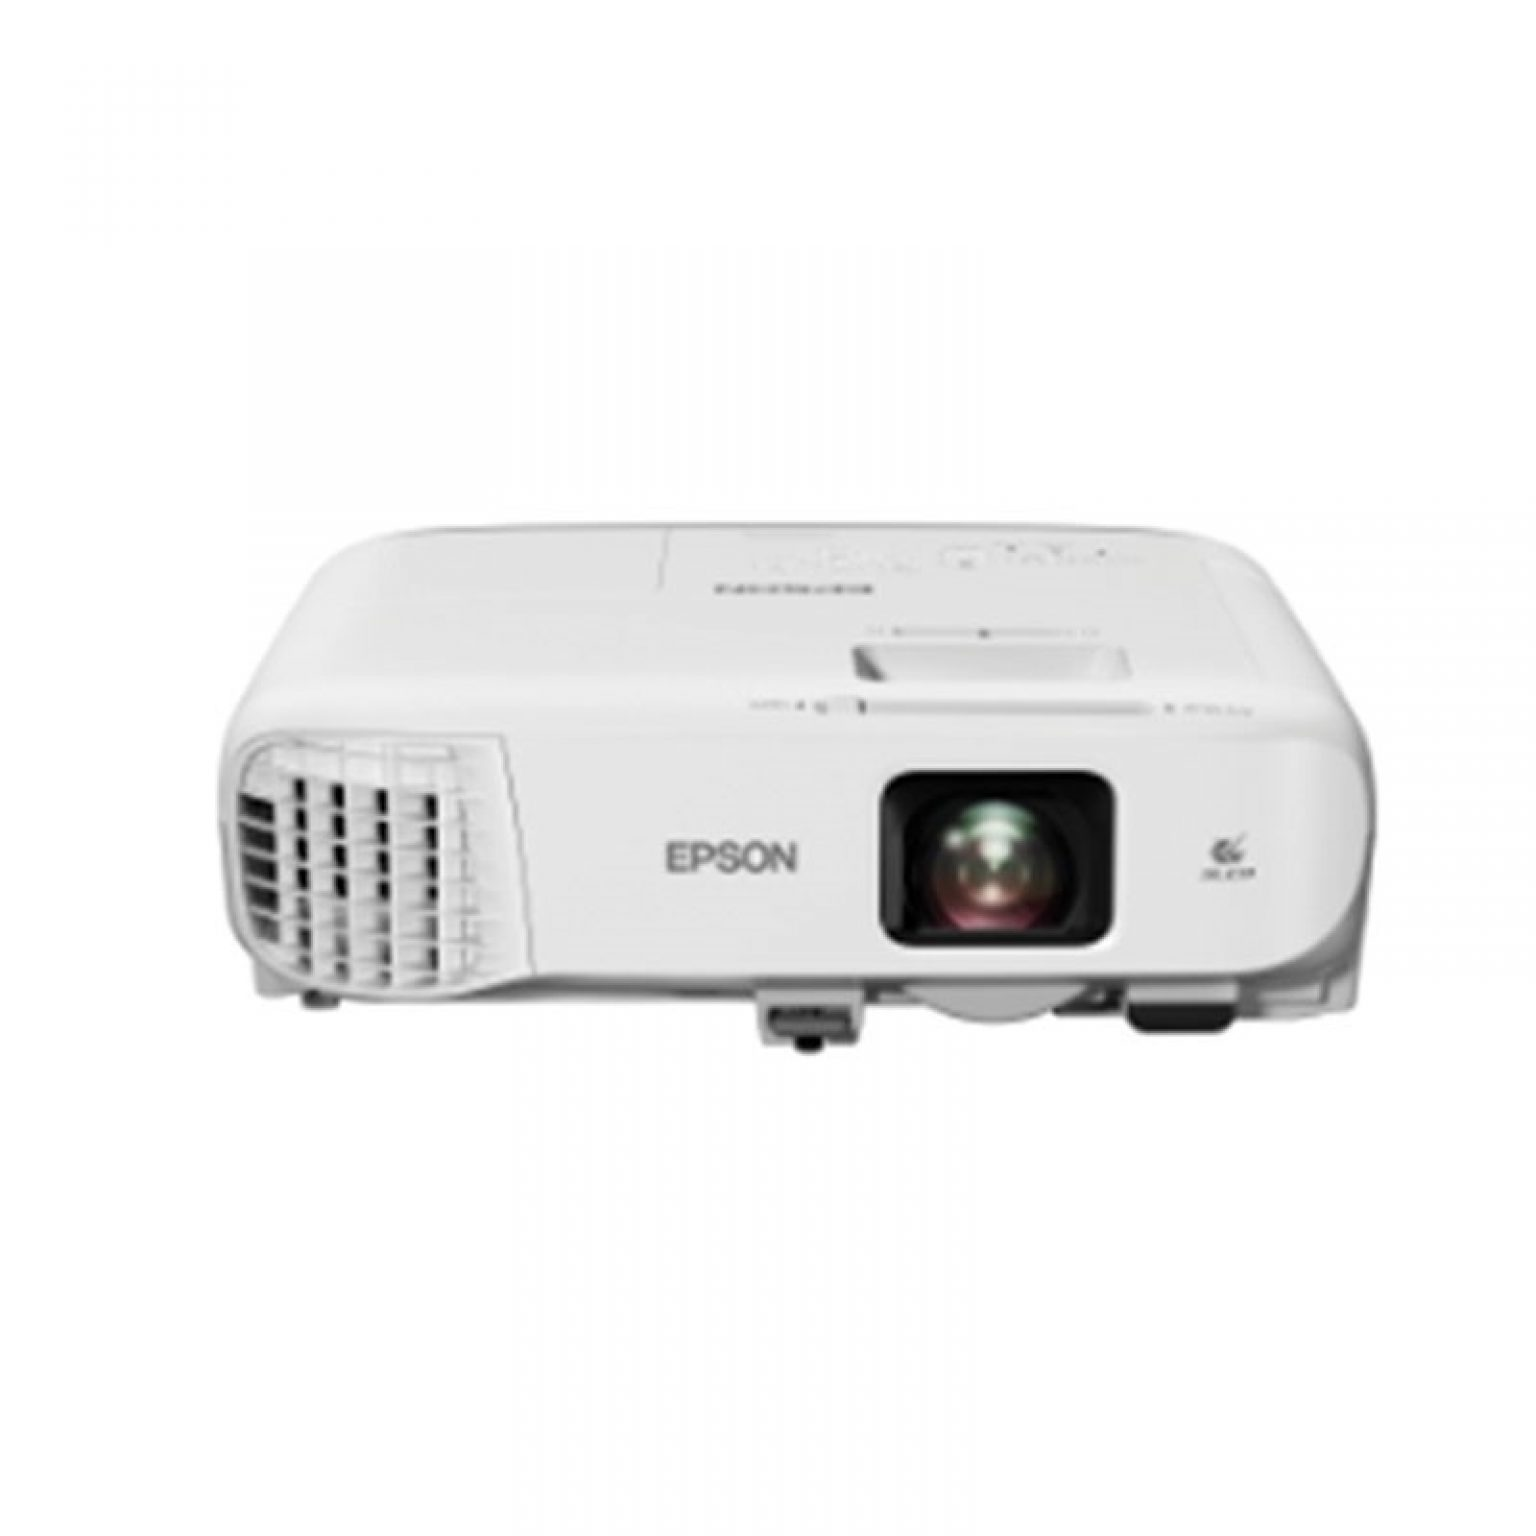 EPSON - Projector EB-2142W